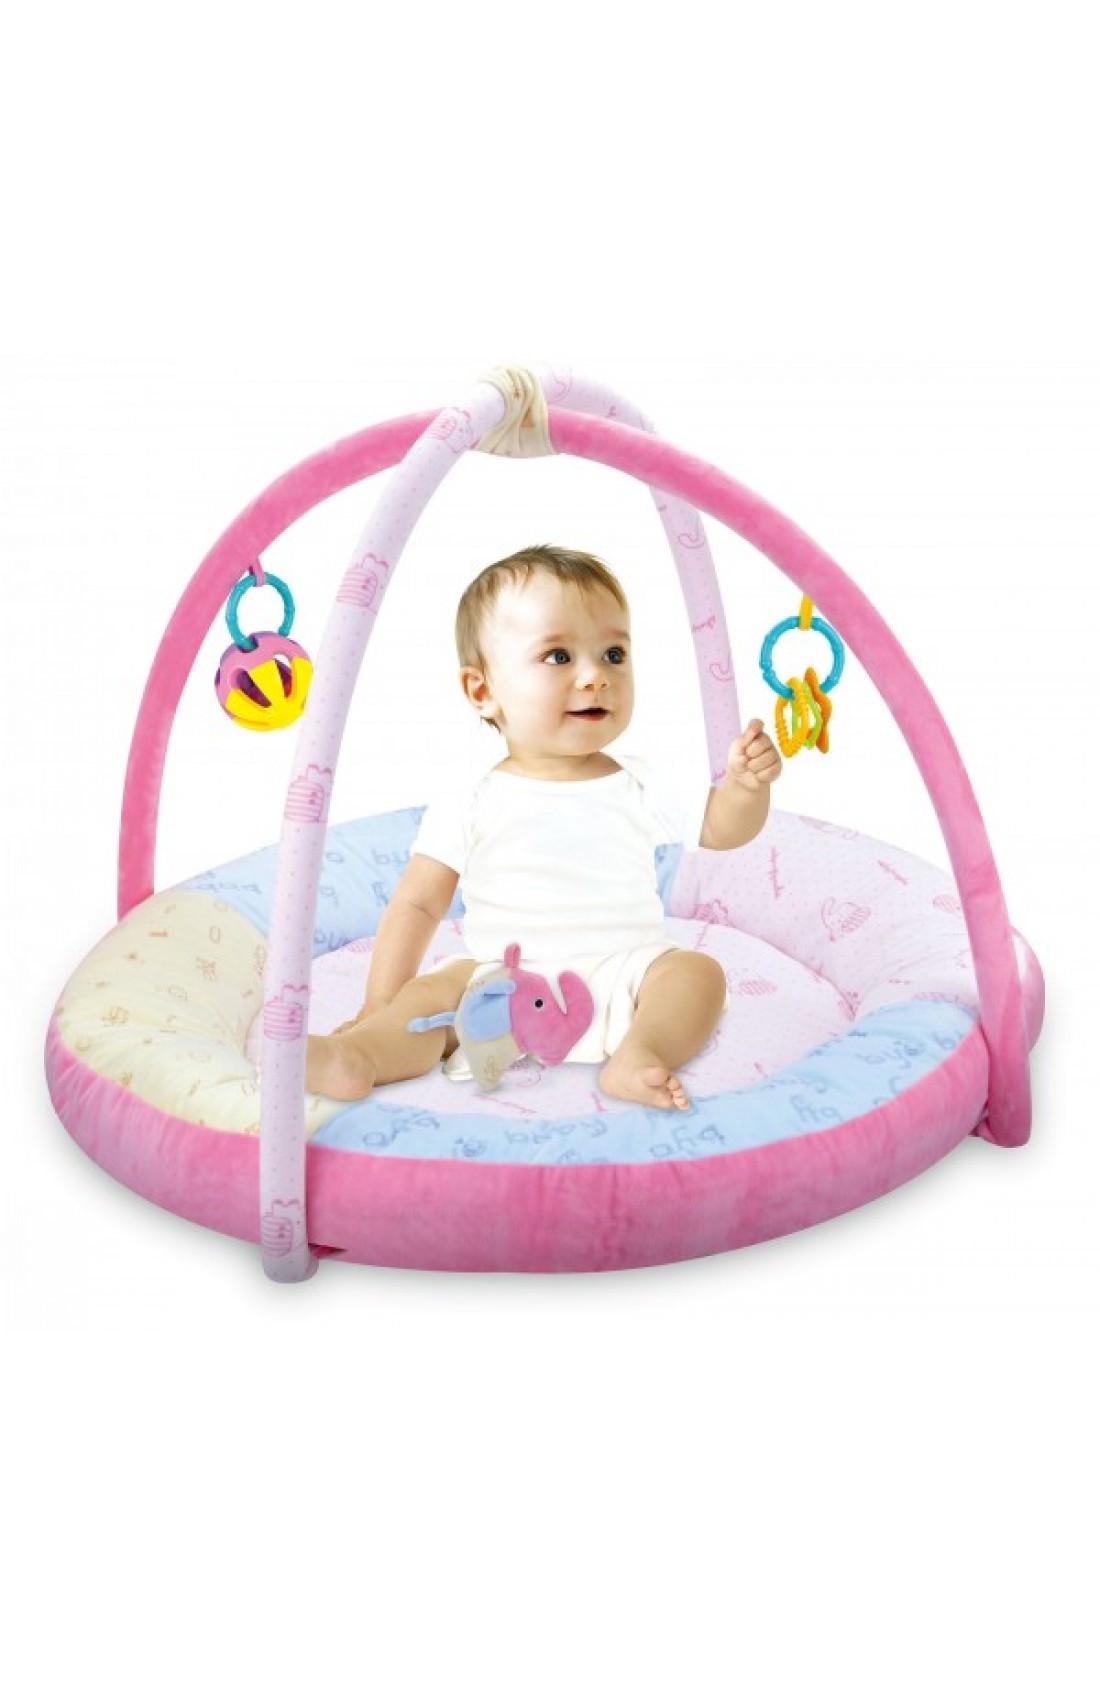 Baby Play Mat Activity Gym // Elephant design